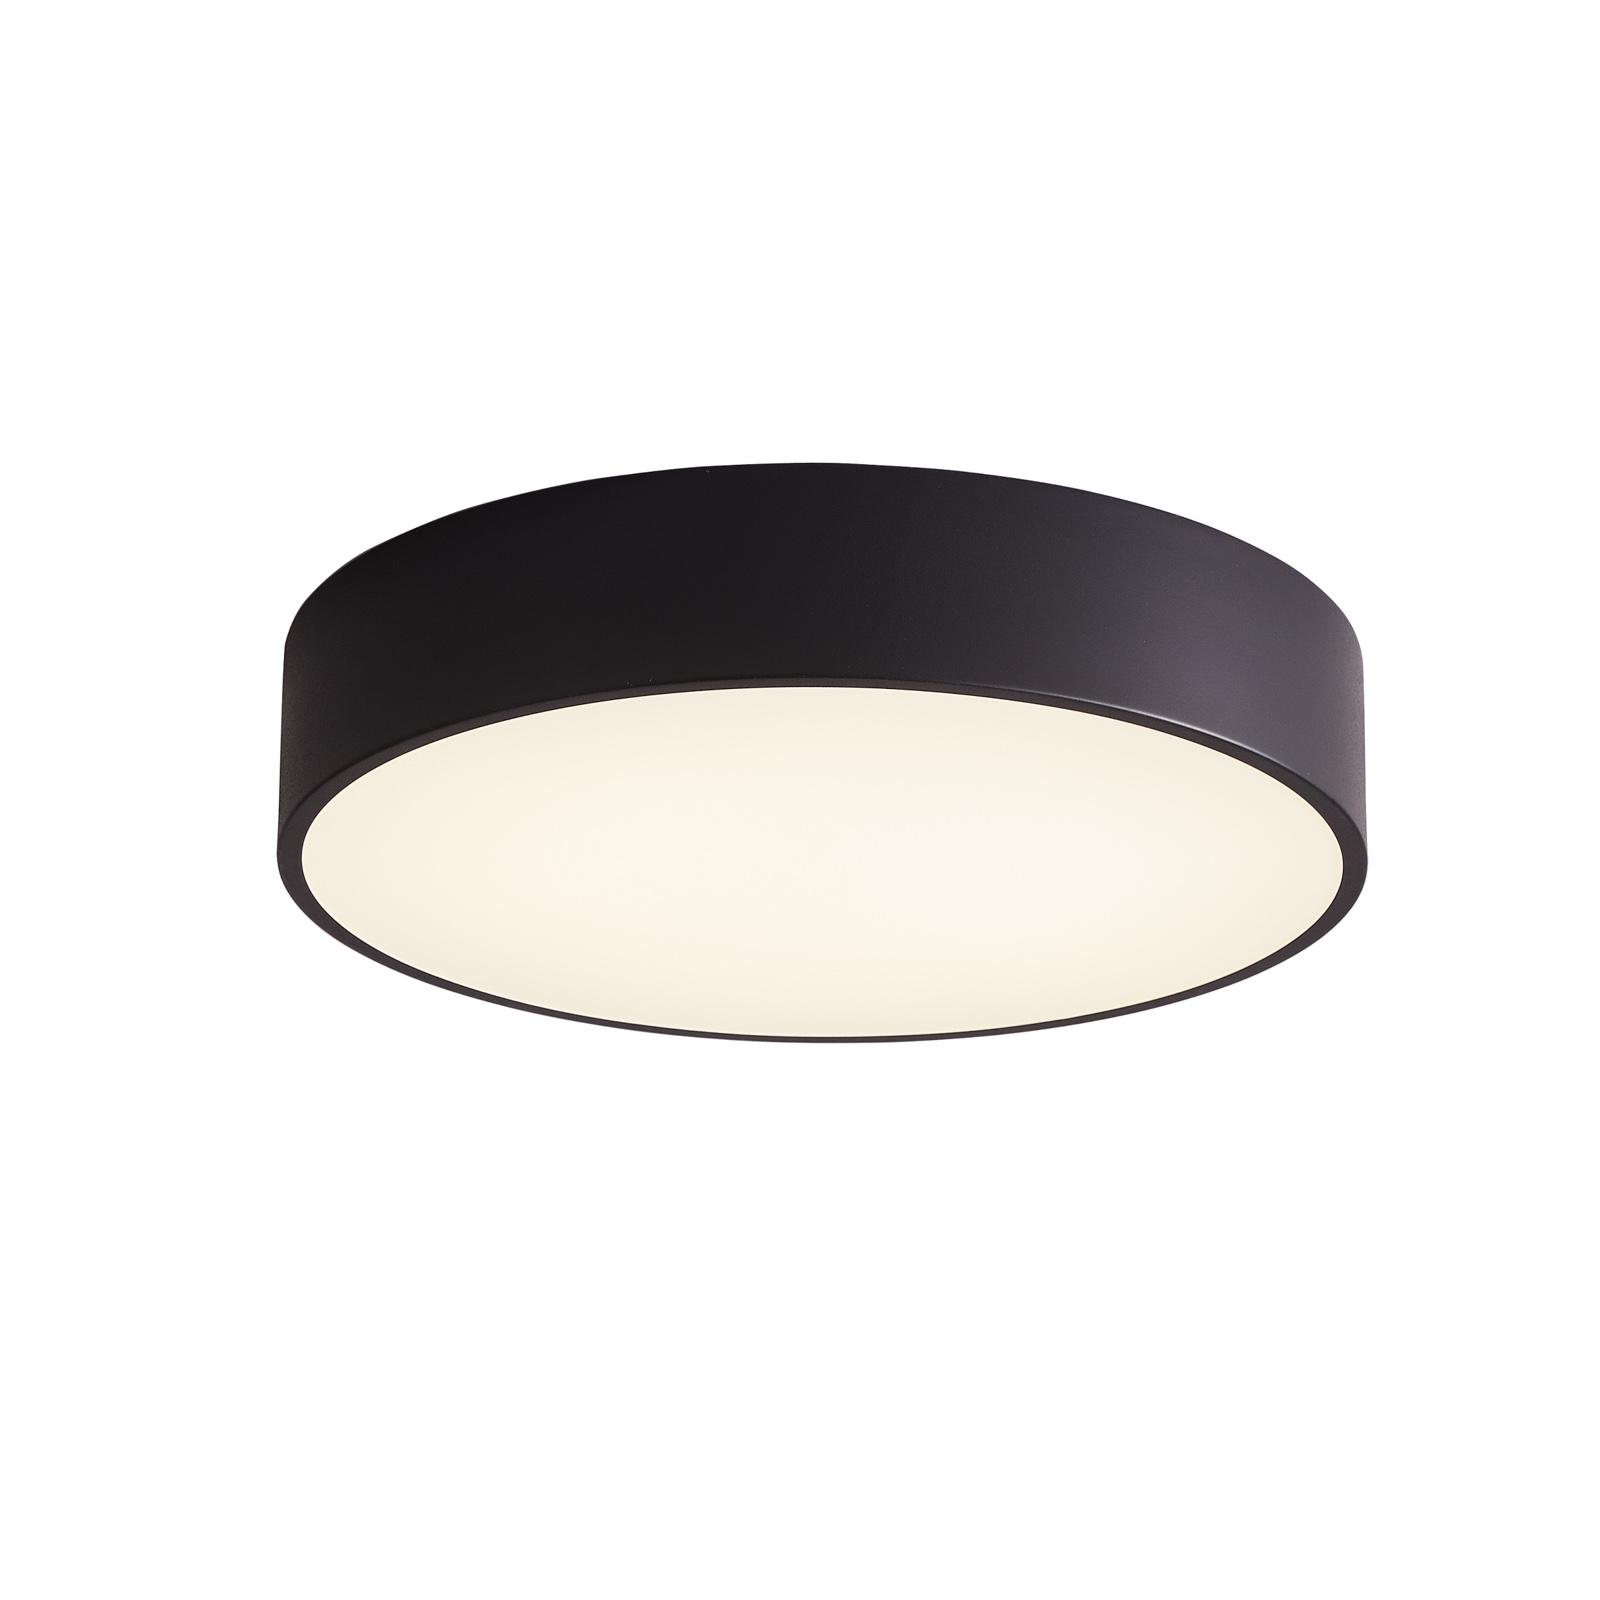 Arcchio Noabelle LED-taklampe, svart, 40 cm